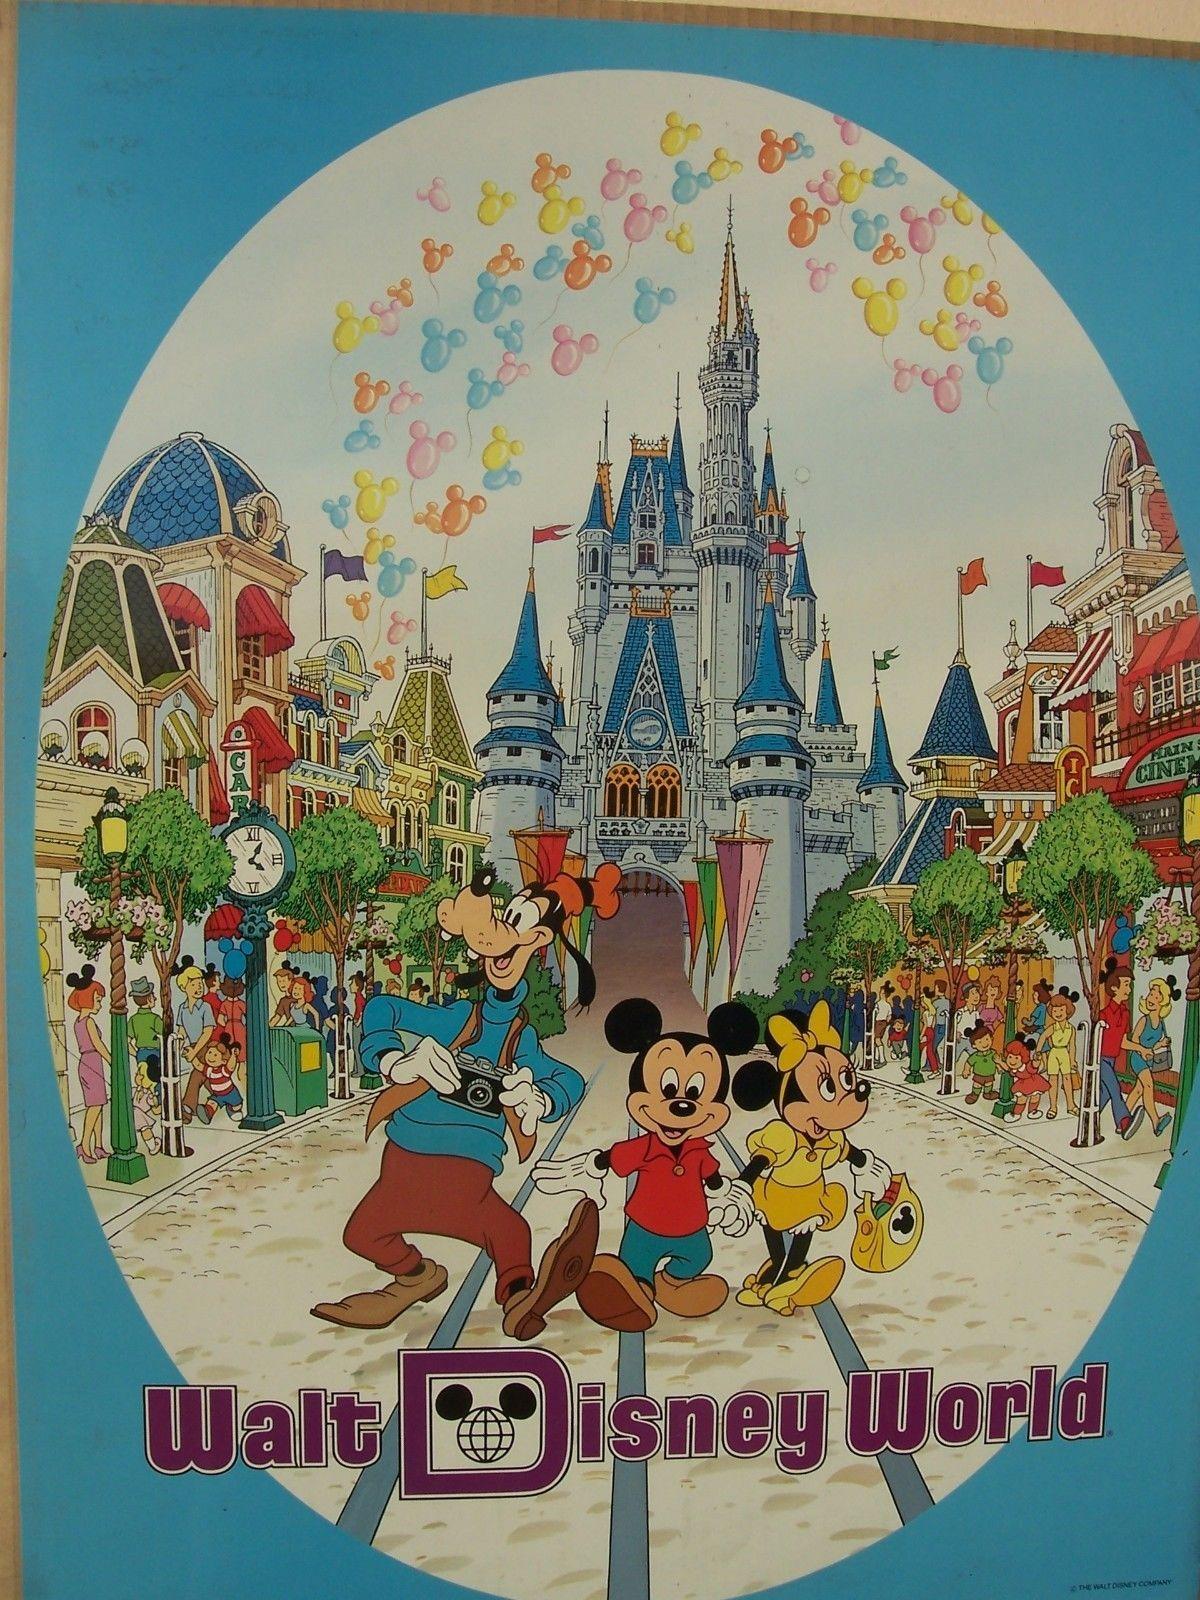 Walt Disney World Mickey Minnie Goofy 18 X 24 Poster Vintage Retro Disney Vintage Disney Posters Disney Posters